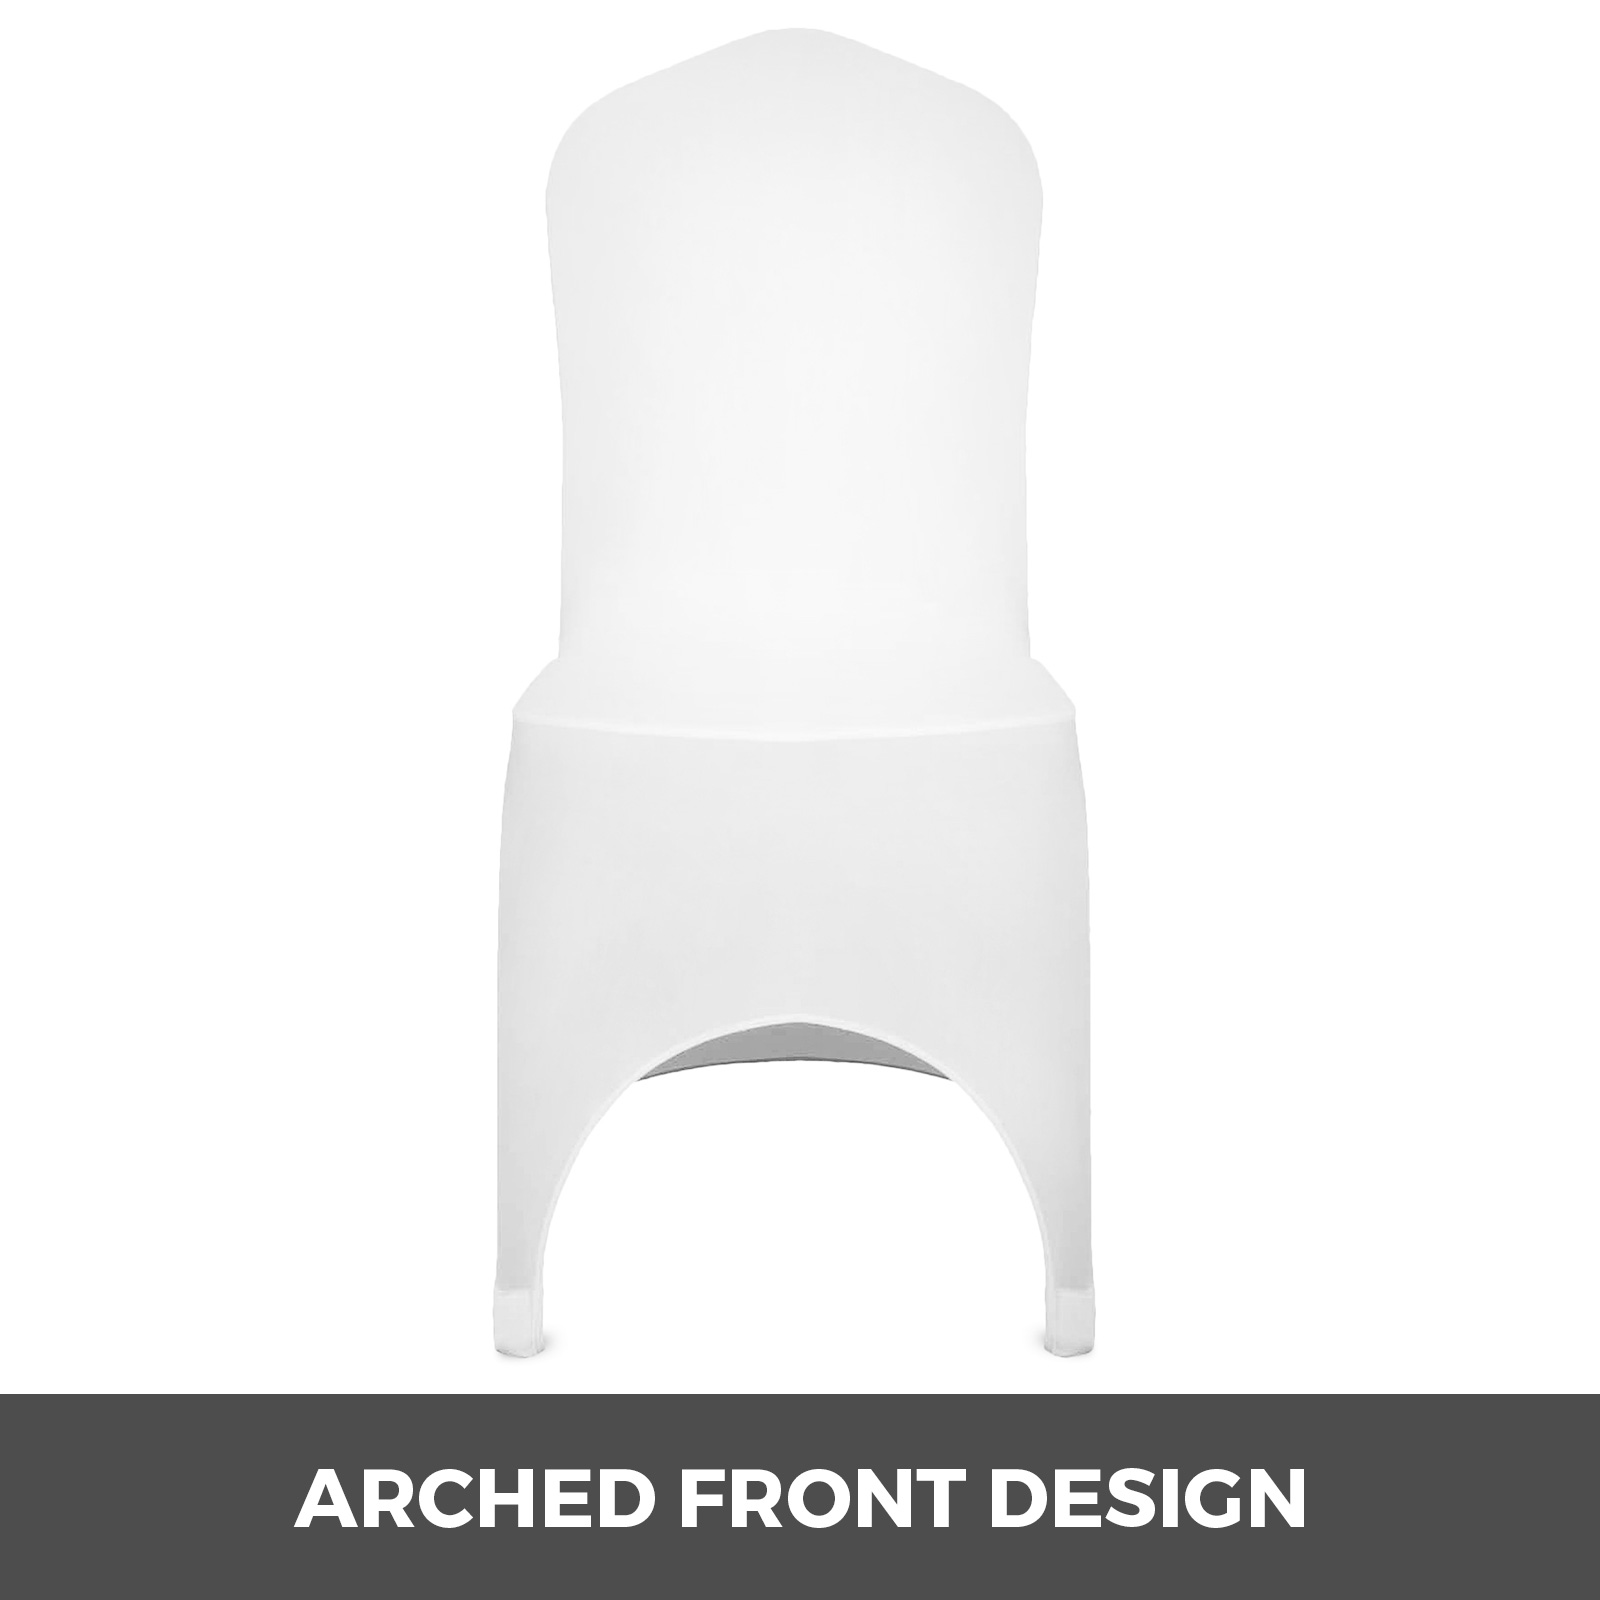 100 50x housses de chaise spandex lycra h tel restaurant mariage soir e f te ebay. Black Bedroom Furniture Sets. Home Design Ideas